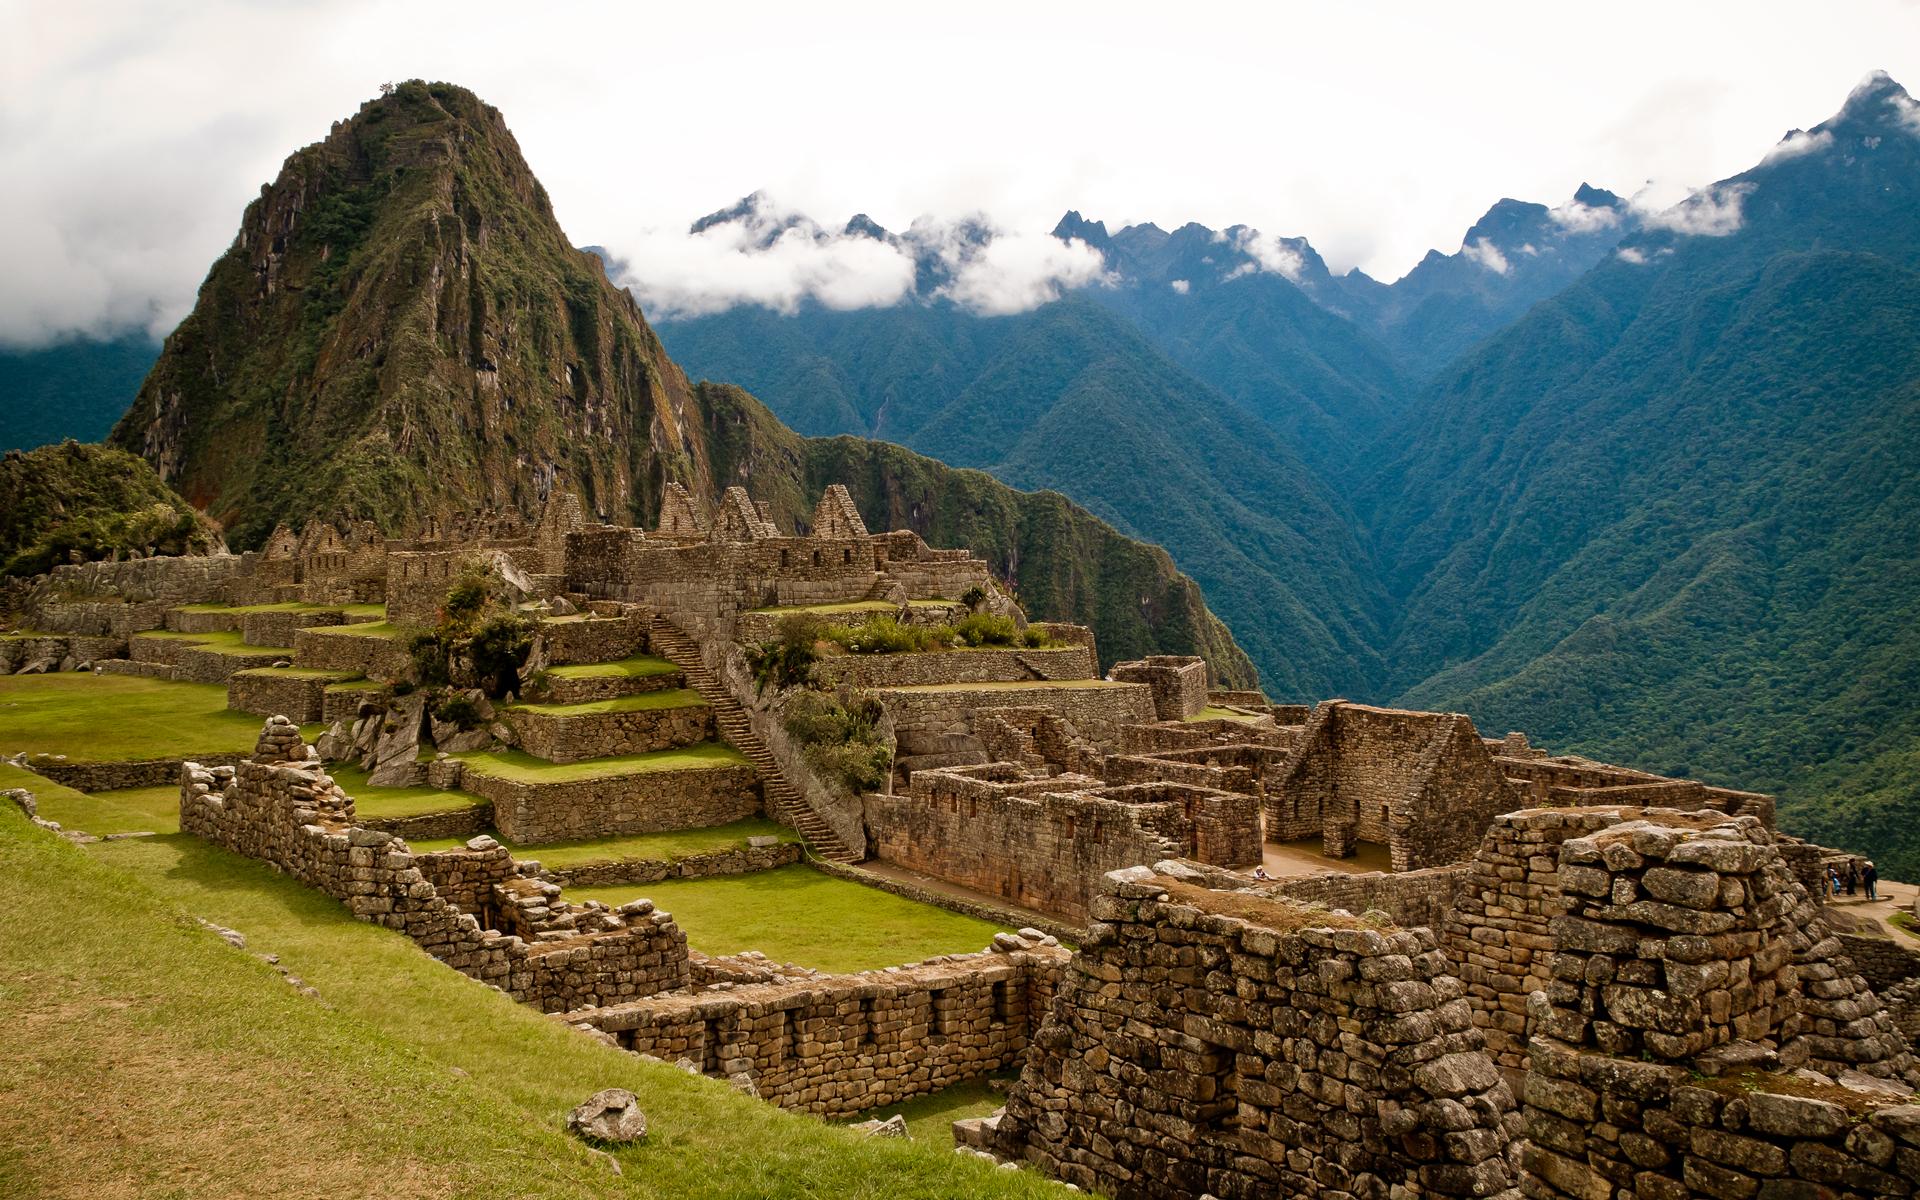 48 Machu Picchu Wallpaper Widescreen On Wallpapersafari